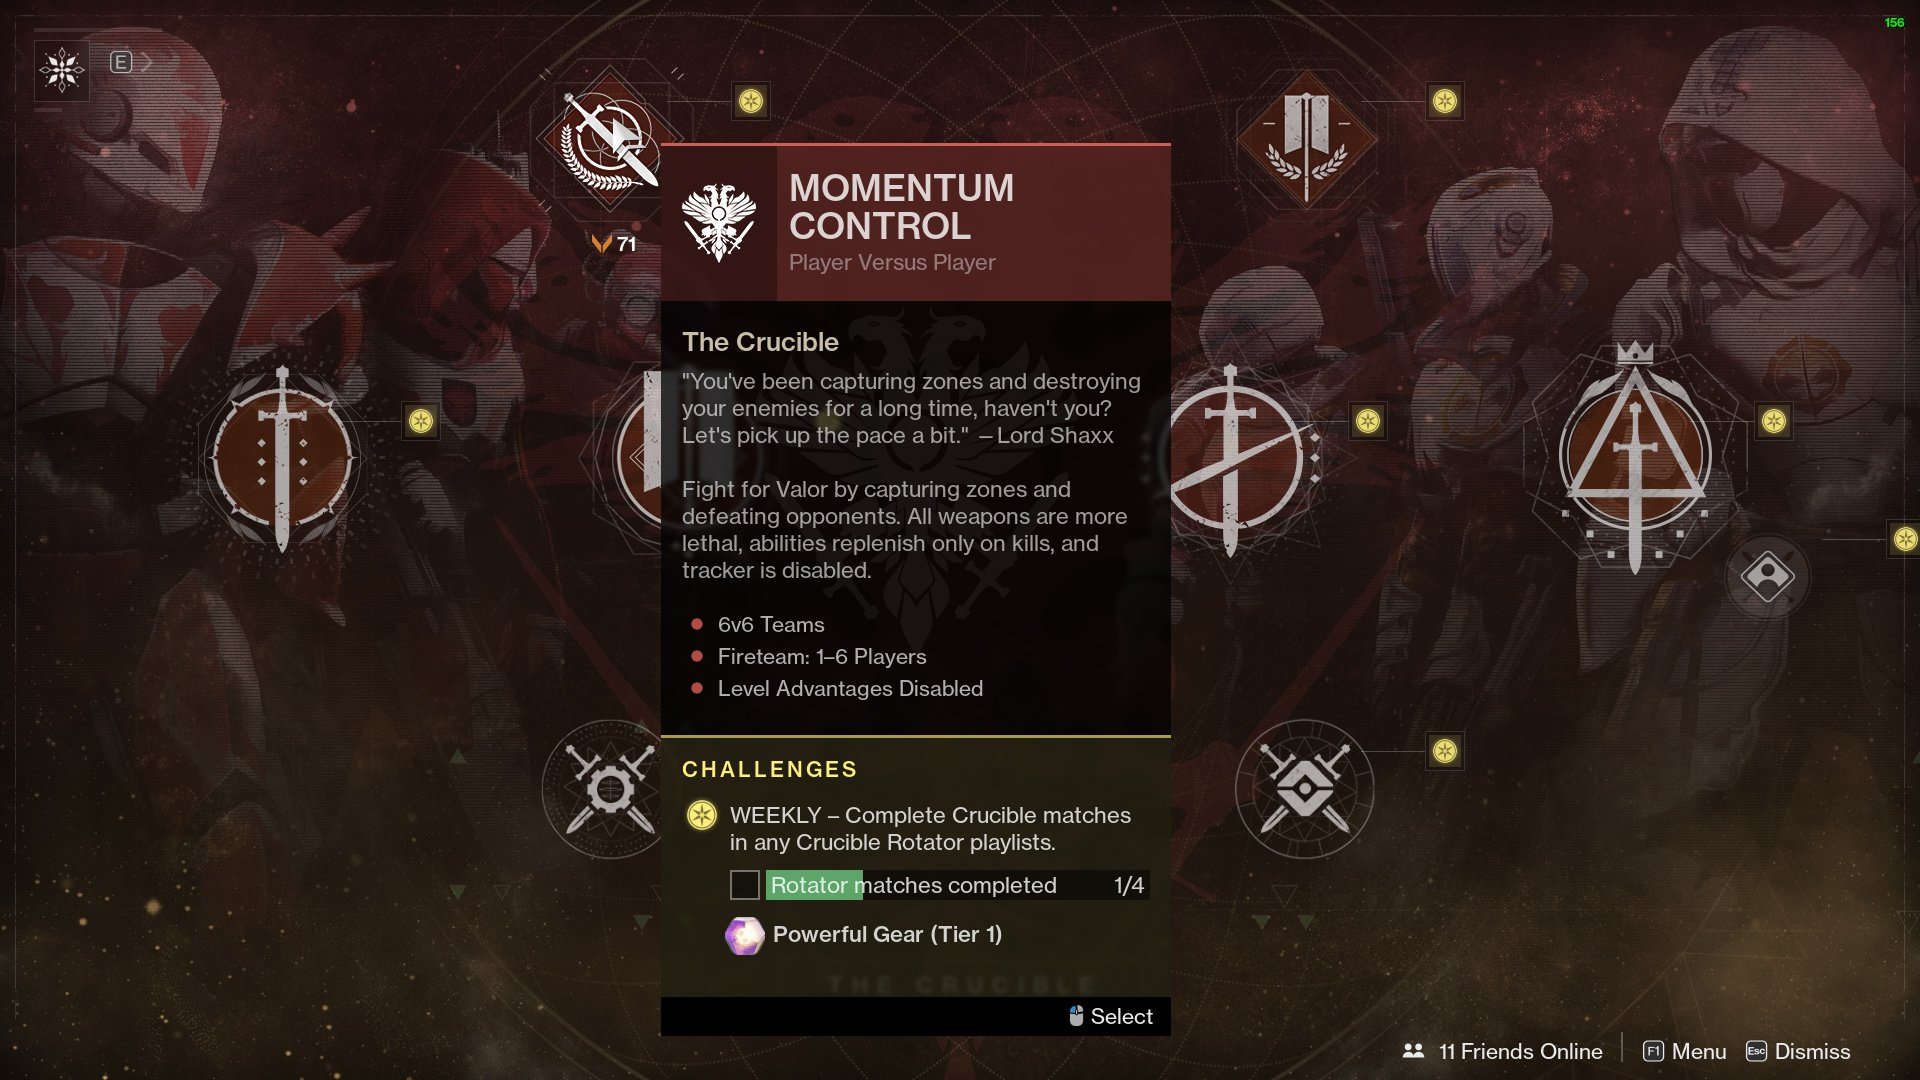 destiny 2 momentum control